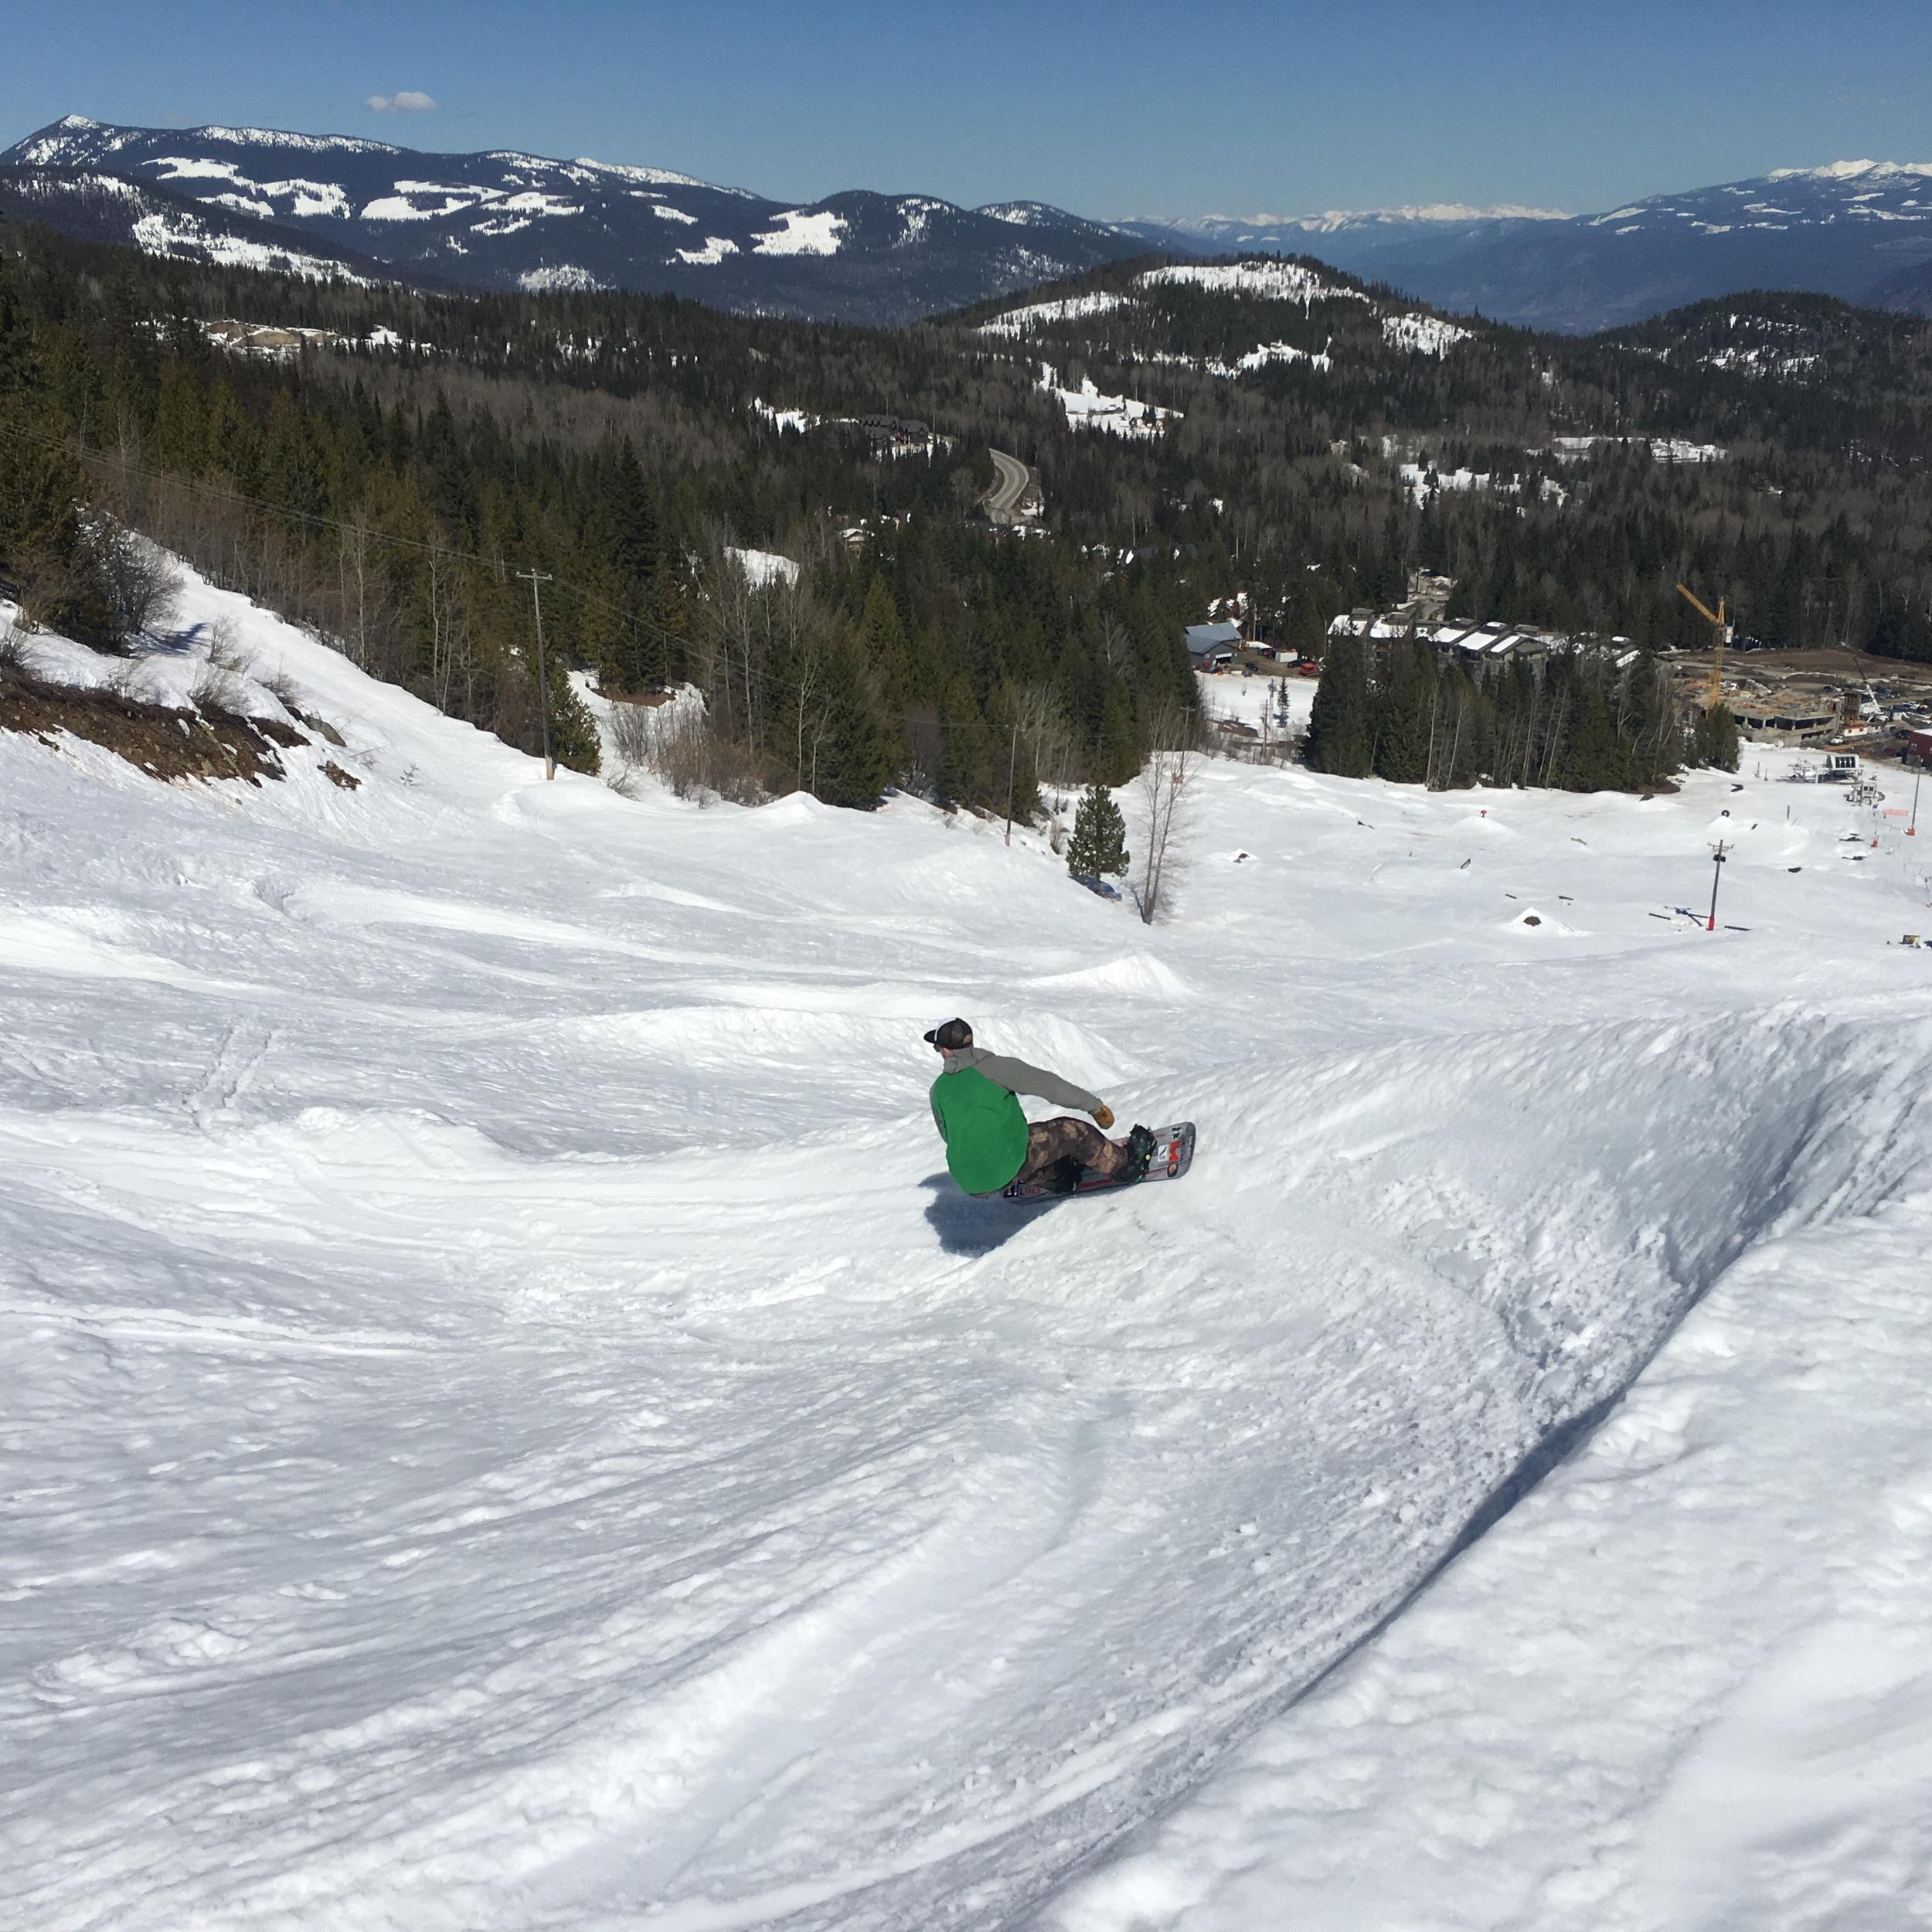 Brian smashing down the banked slalom at Red Mountain Resort  Photo: Zach